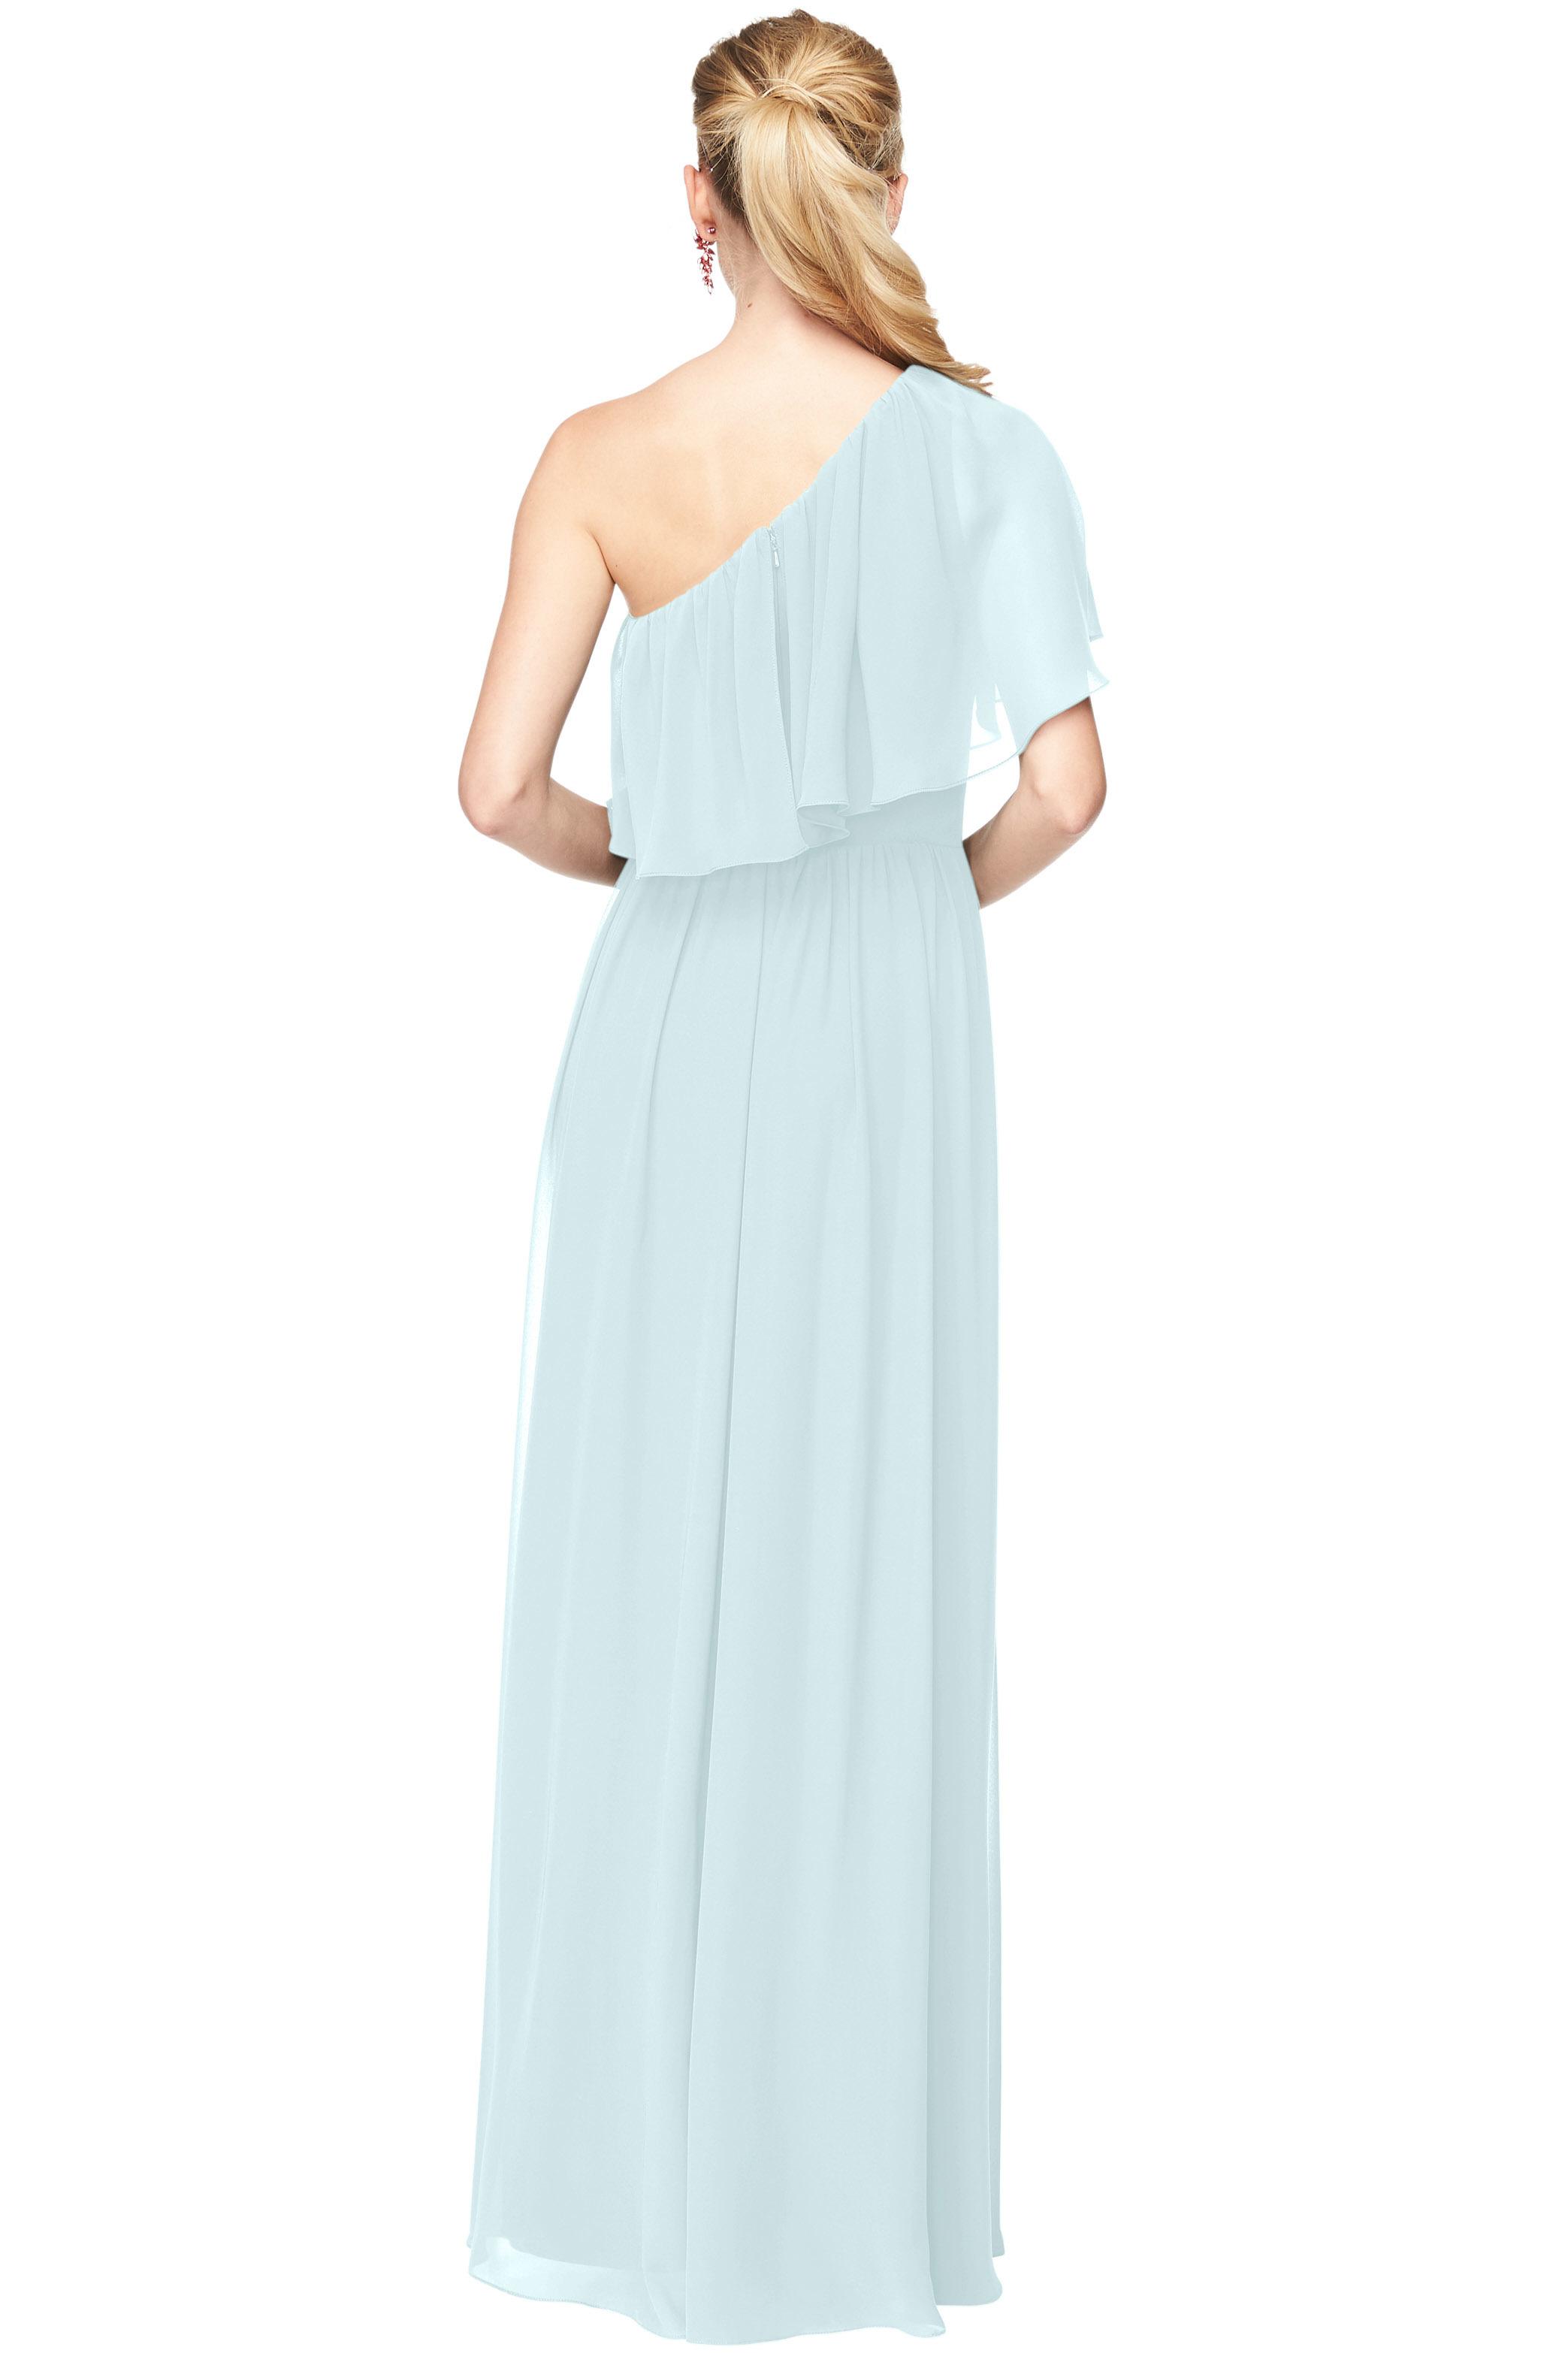 Bill Levkoff PALE BLUE Chiffon One Shoulder A-Line gown, $184.00 Back